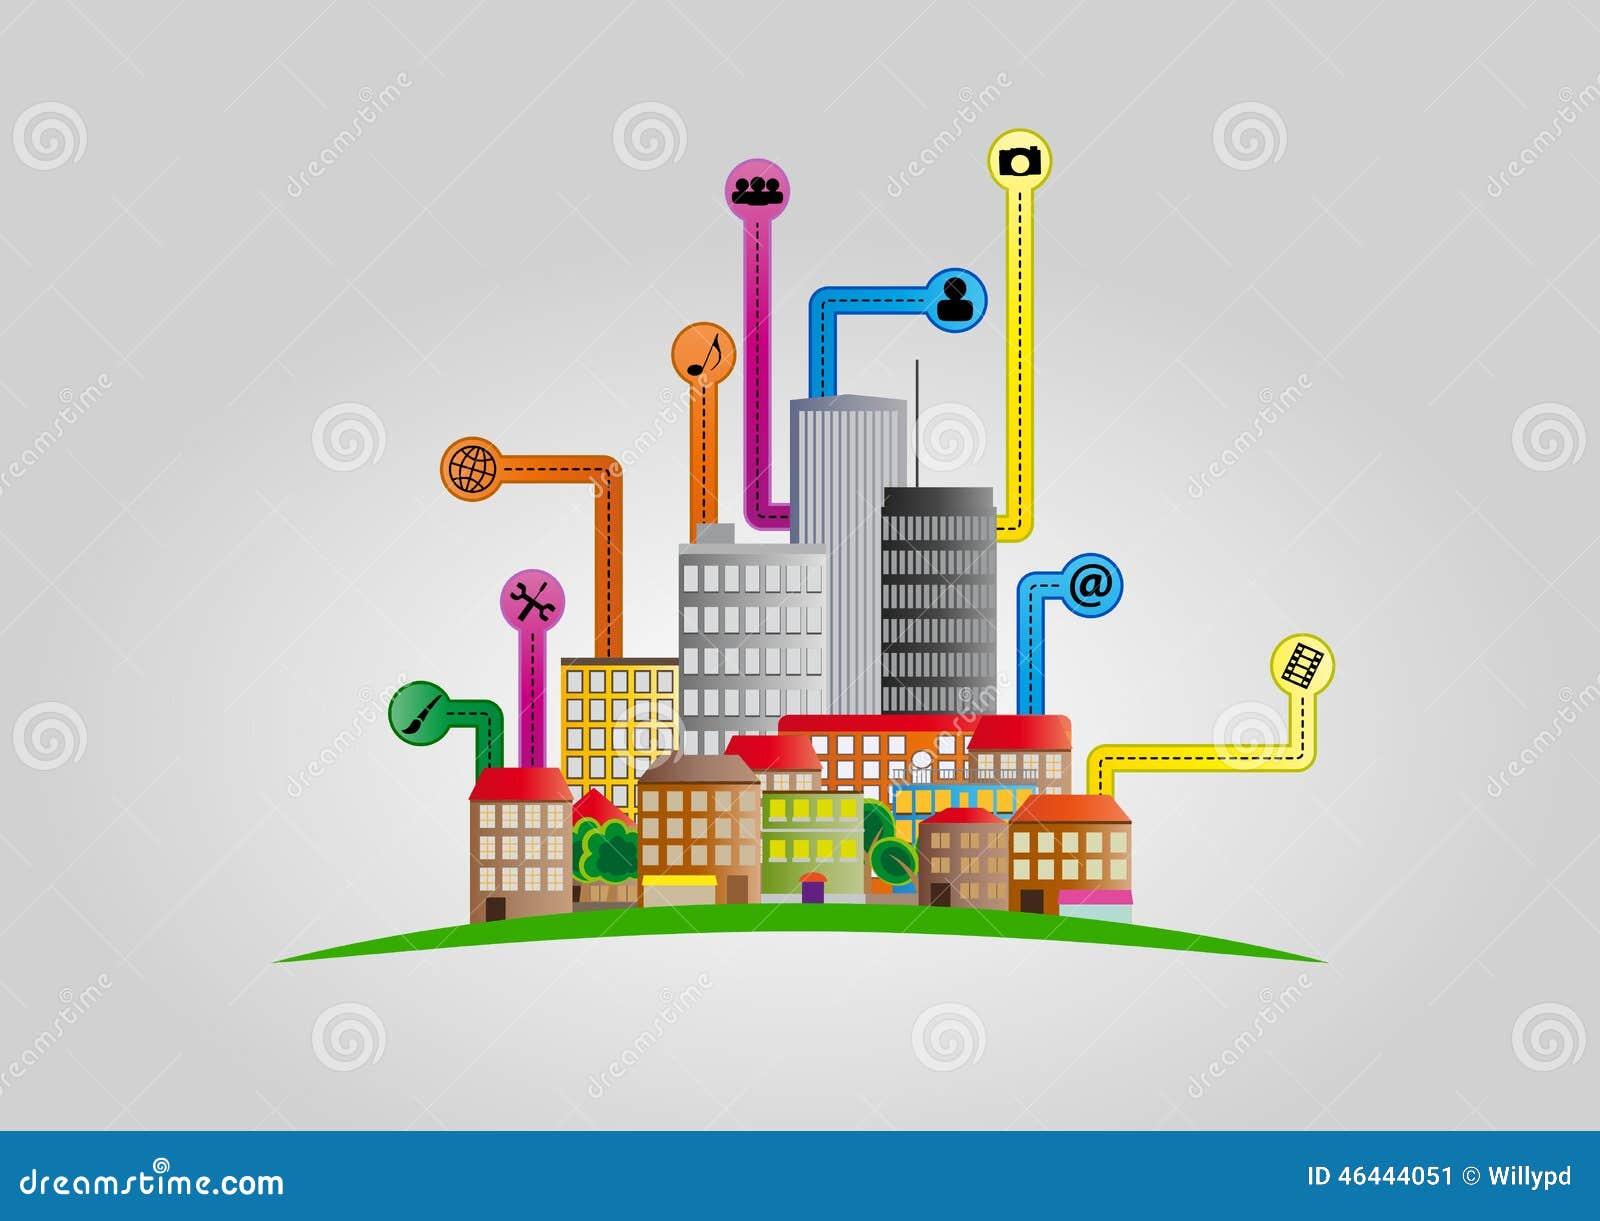 Home Network Design App Smart City Stock Vector Image 46444051